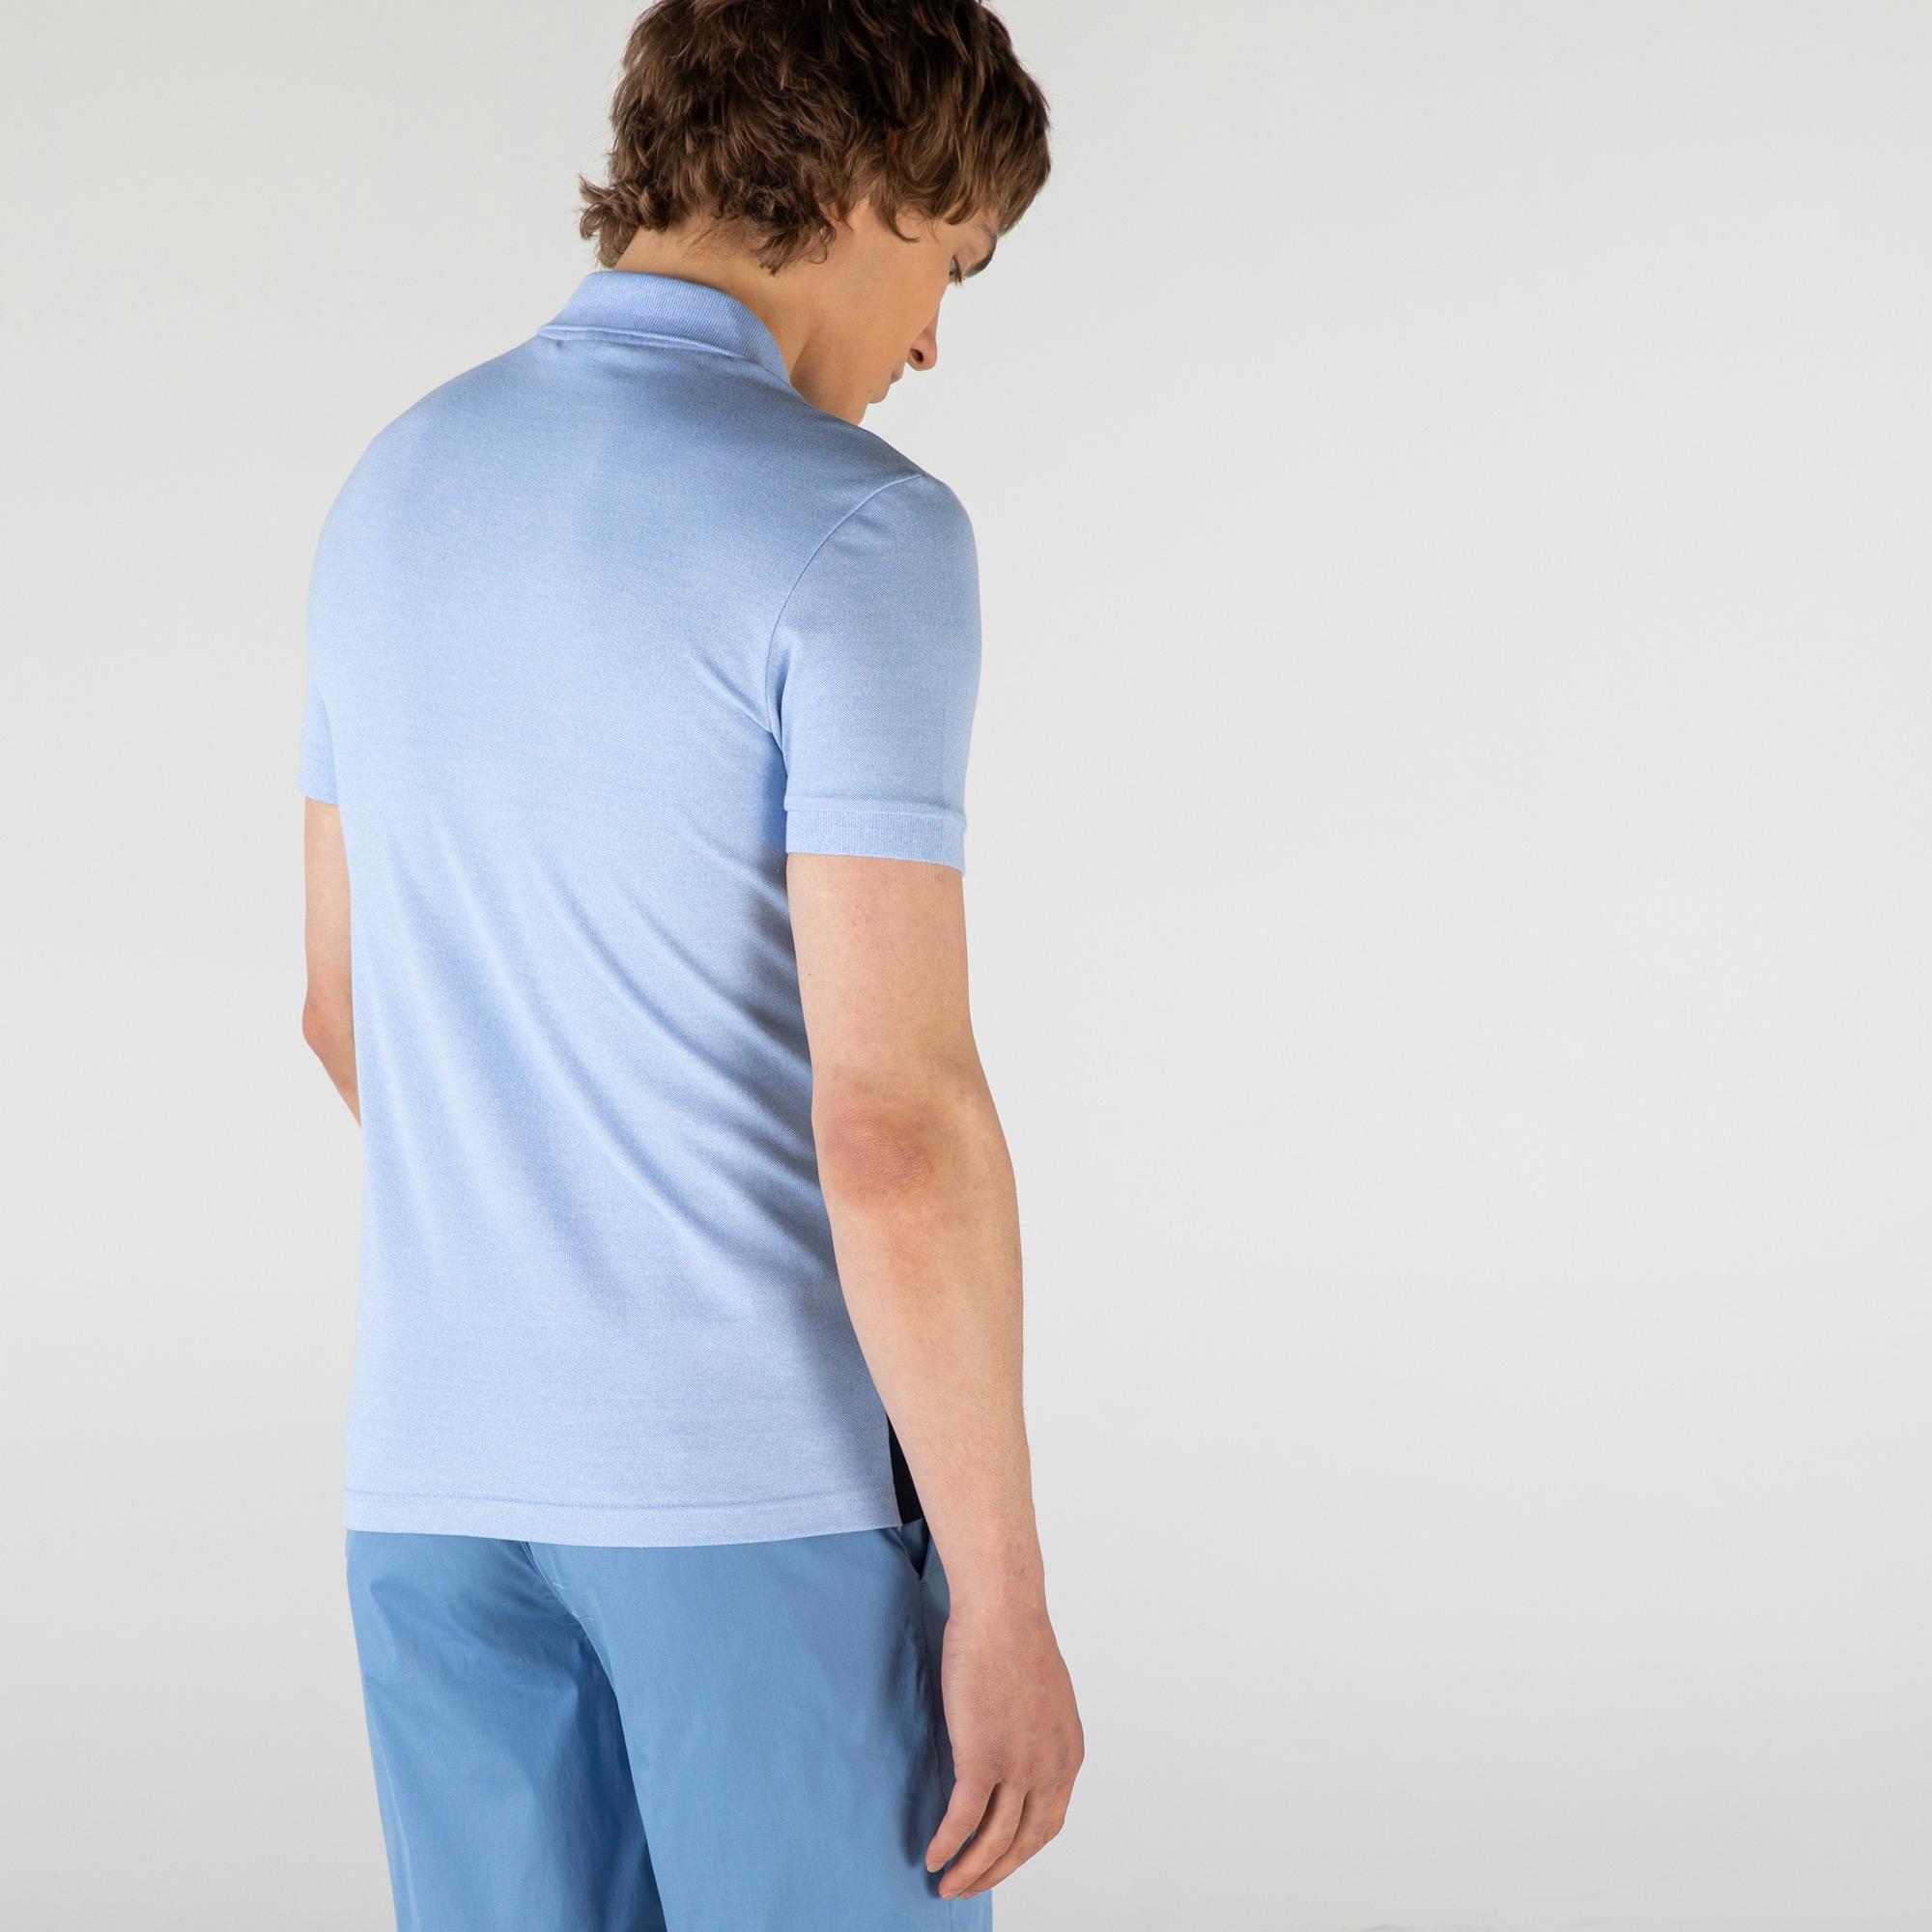 Lacoste Erkek Slim Fit Fermuar Yaka Renk Bloklu Mavi Polo